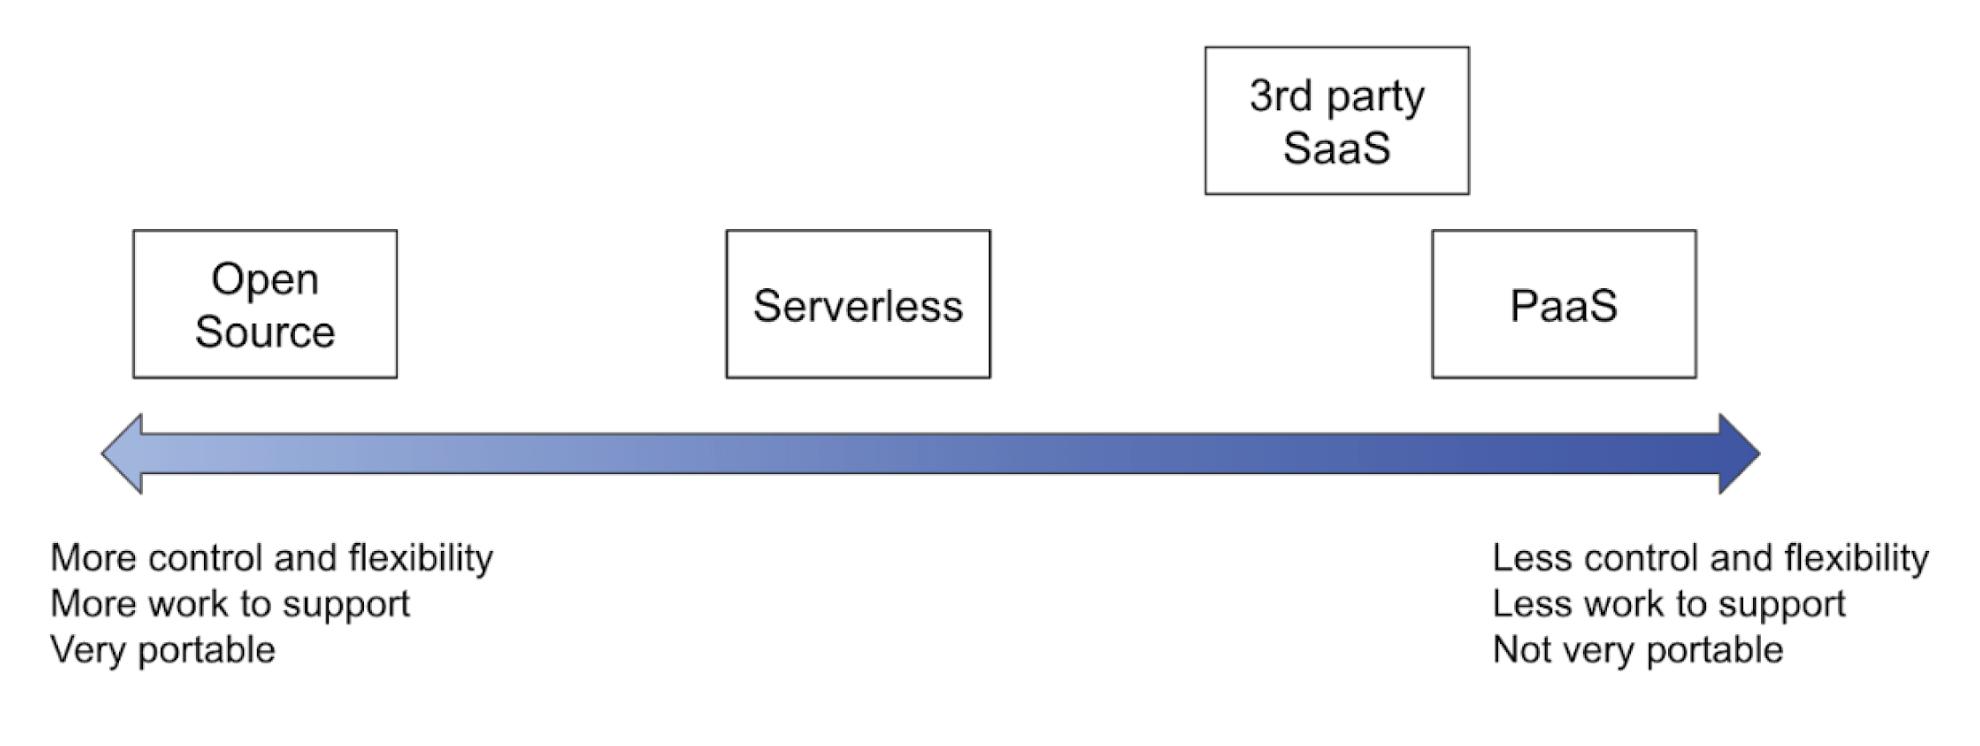 Data platform tool type comparison